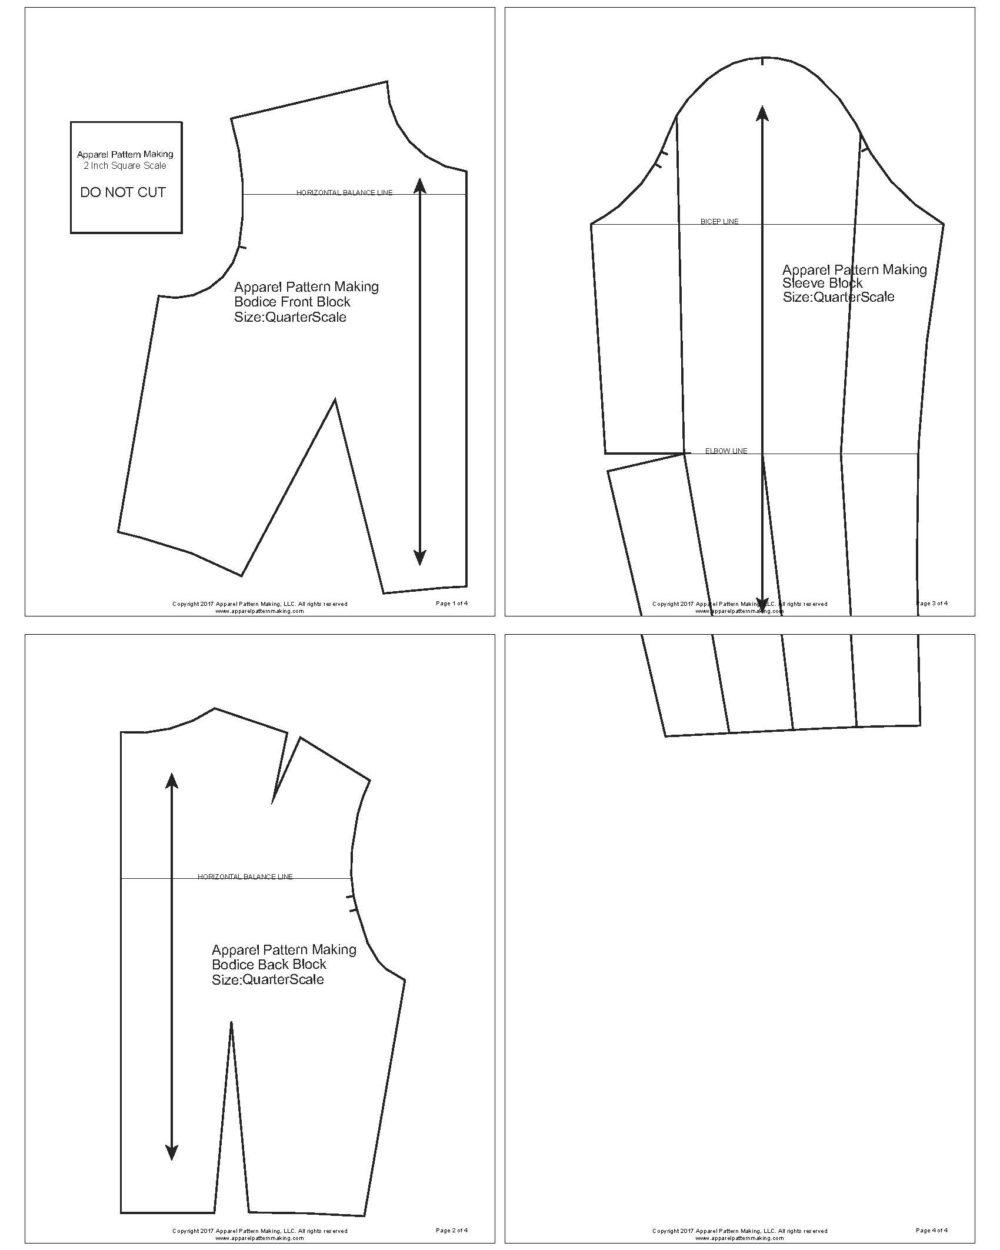 Home Apparel Pattern Making Llc